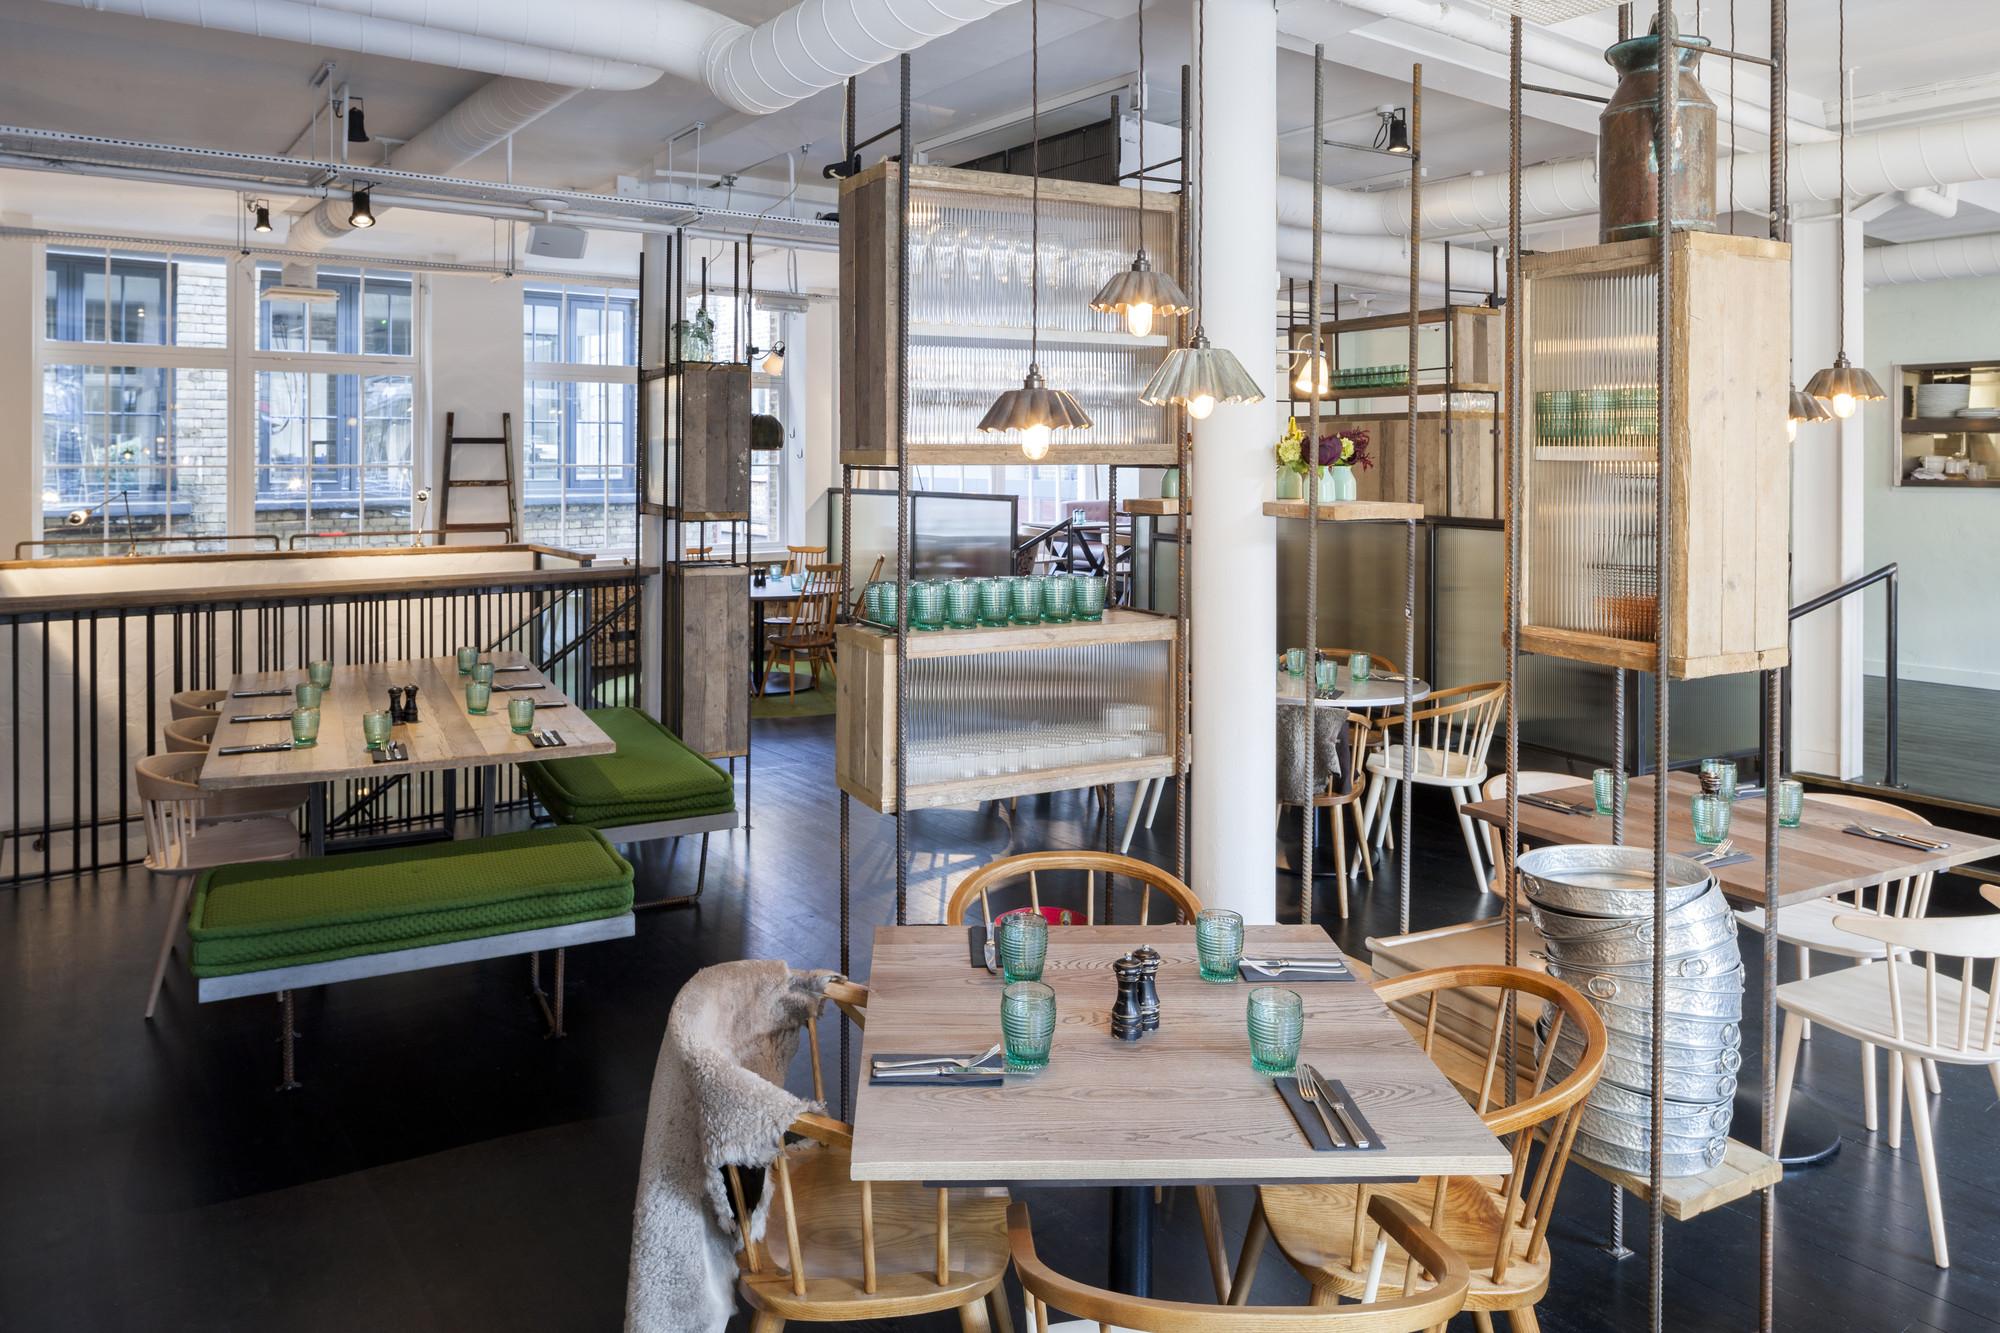 Gallery of 2014 Restaurant  Bar Design Award Winners  25